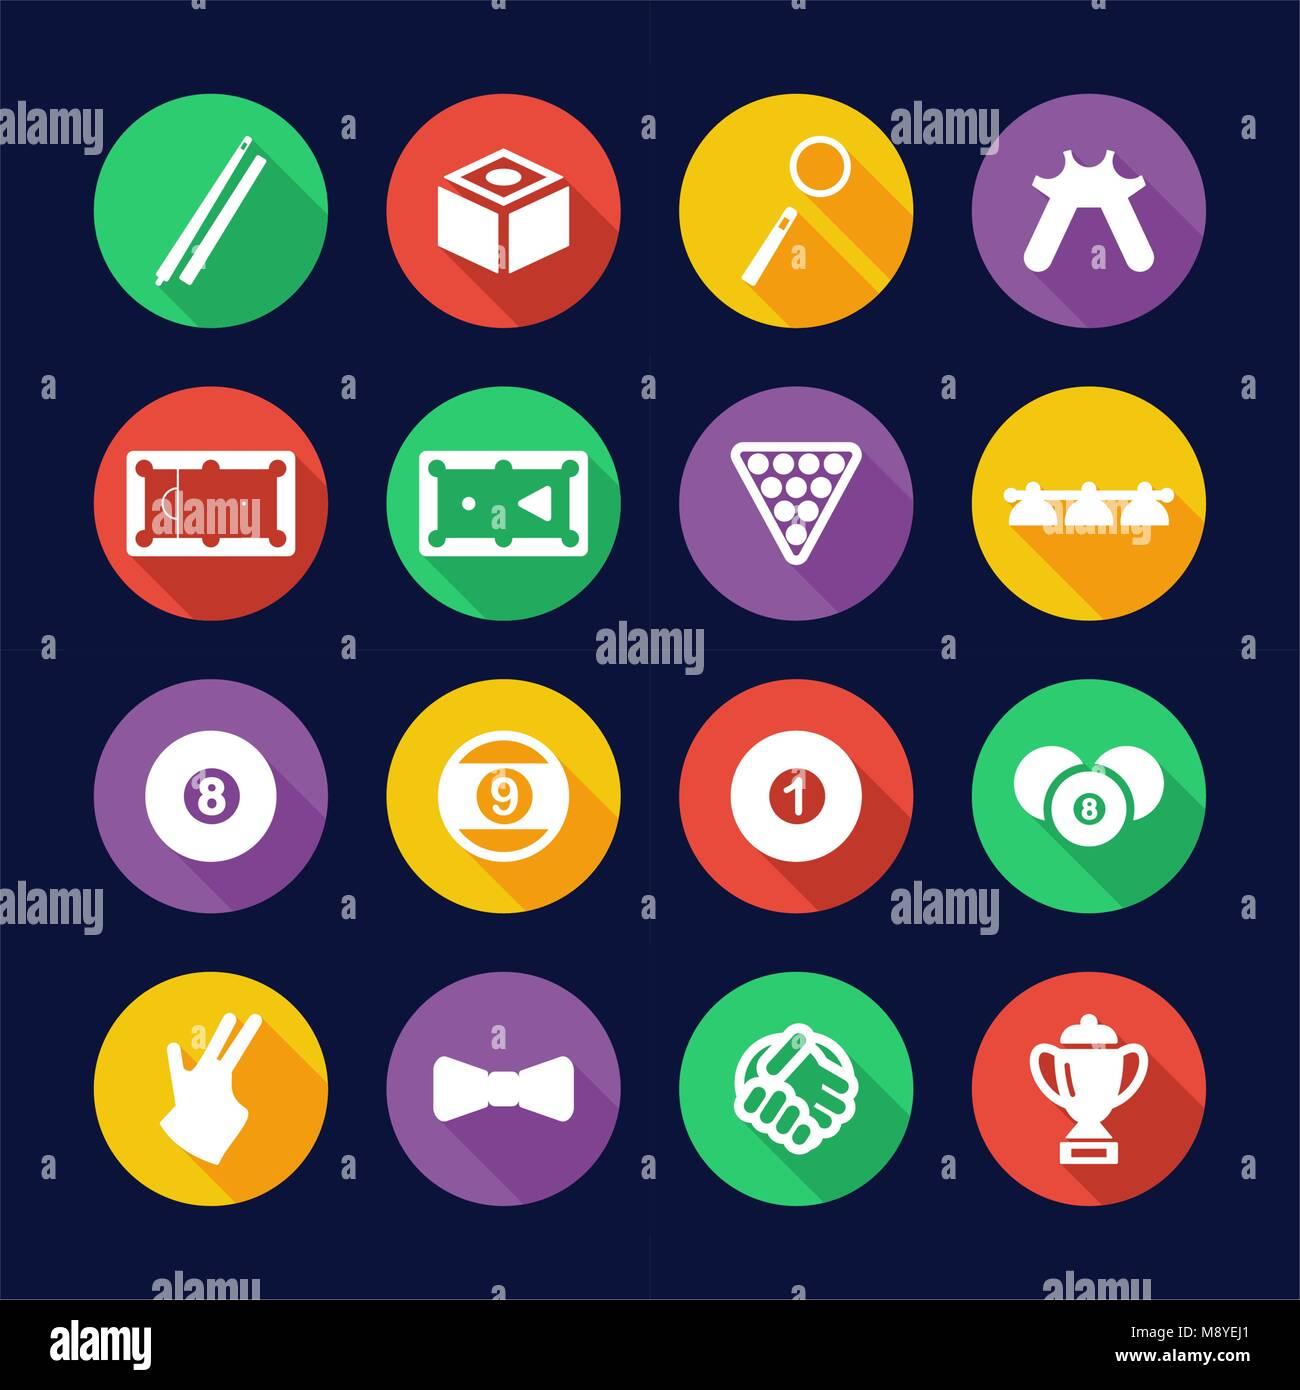 Billiards Icons Flat Design Circle - Stock Vector